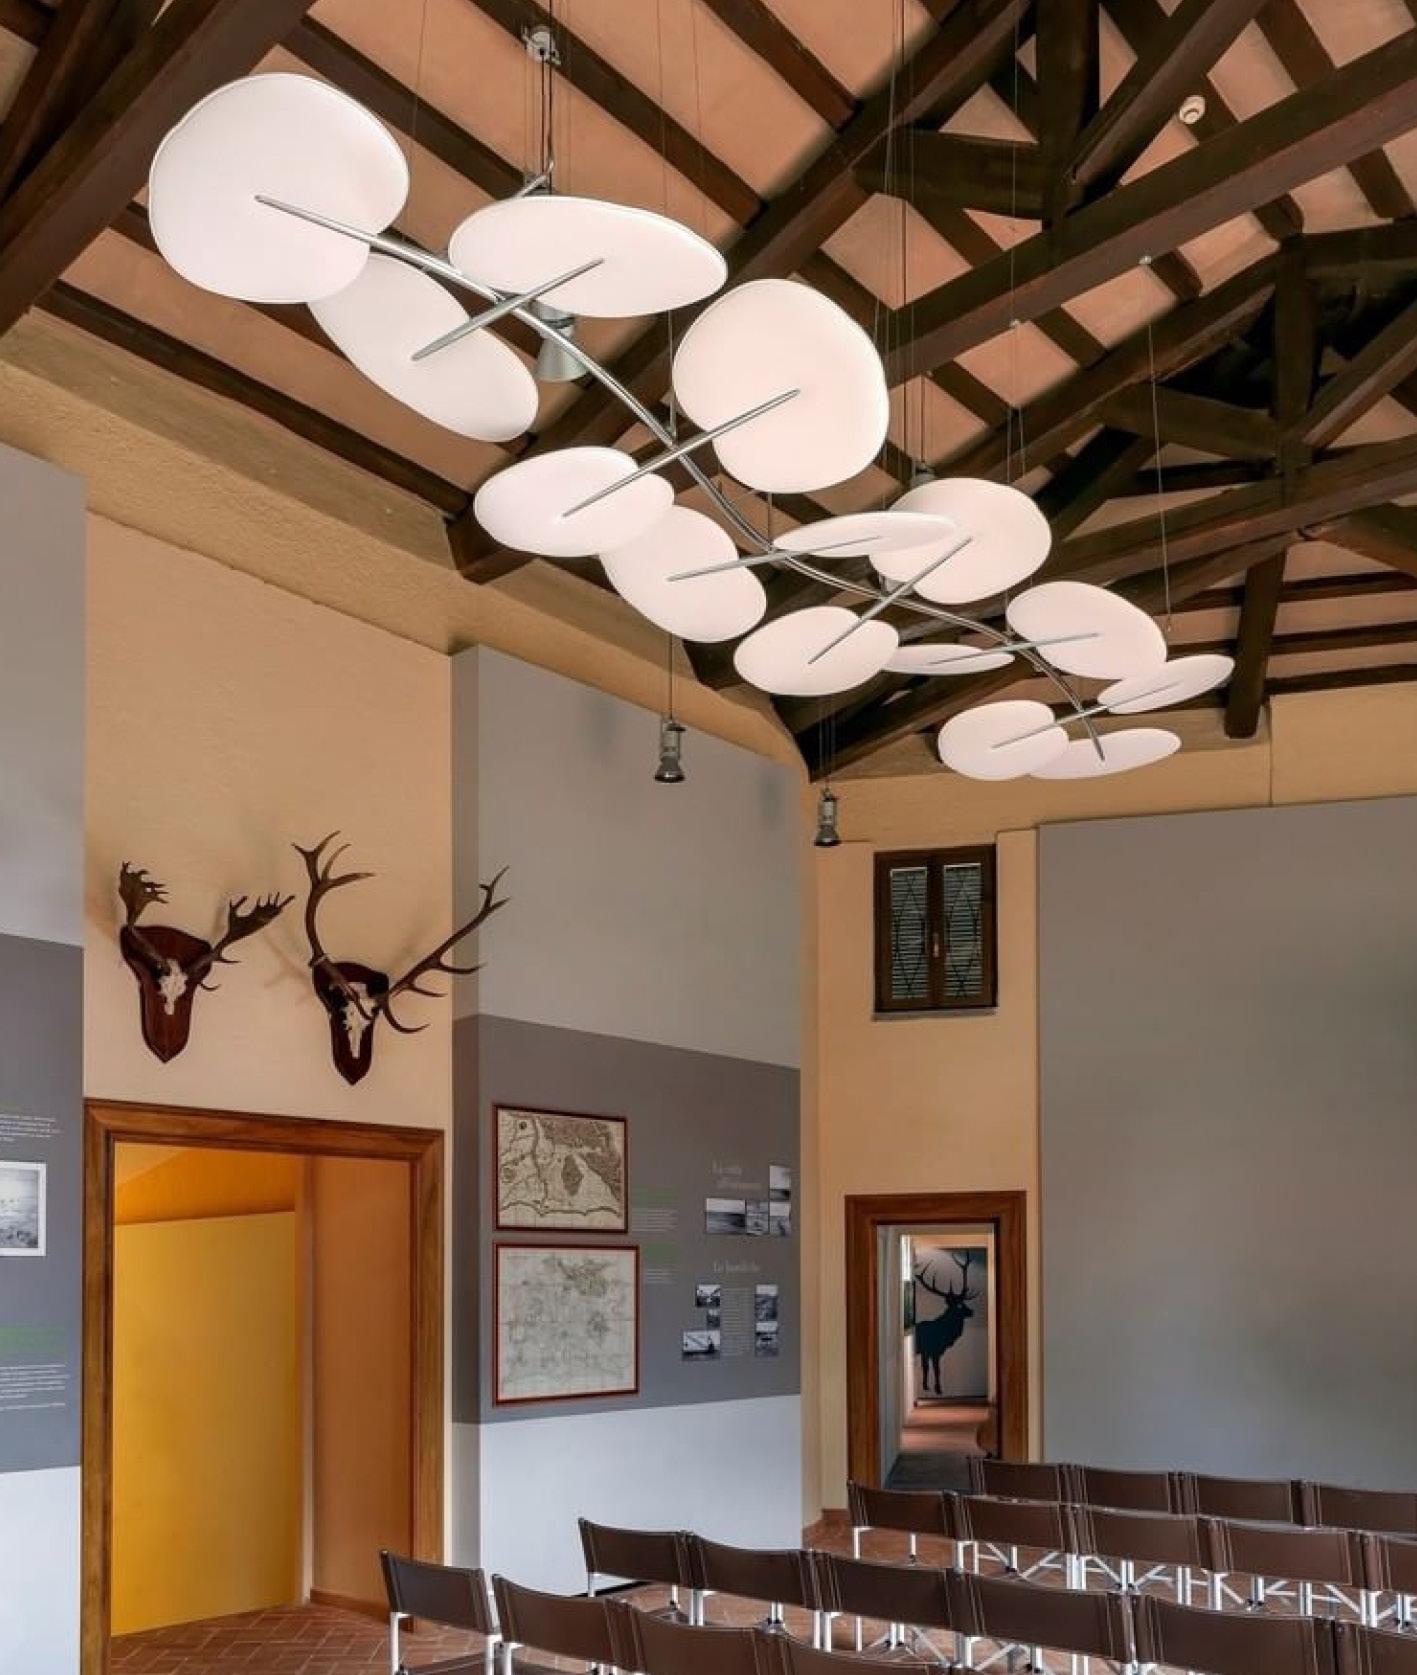 Botanica_Caimi Brevetti_Quirinale Contemporaneo 2020_Sound-absorbing panels_drawing_MT_Mario Trimarchi Design_Product Artworks